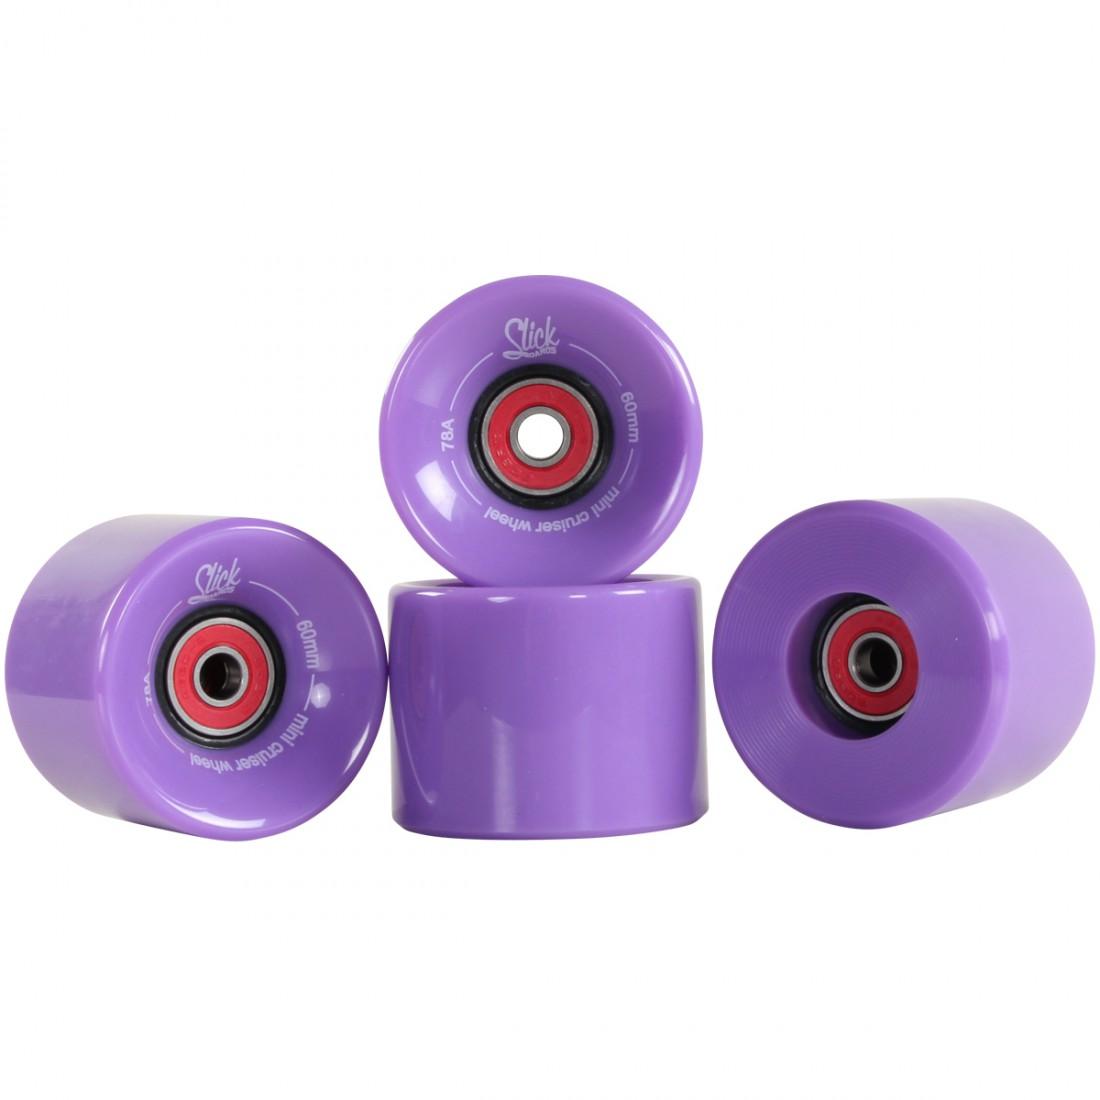 pennyboard skateboard rollen ersatzrollen 60 mm 78a abec9. Black Bedroom Furniture Sets. Home Design Ideas